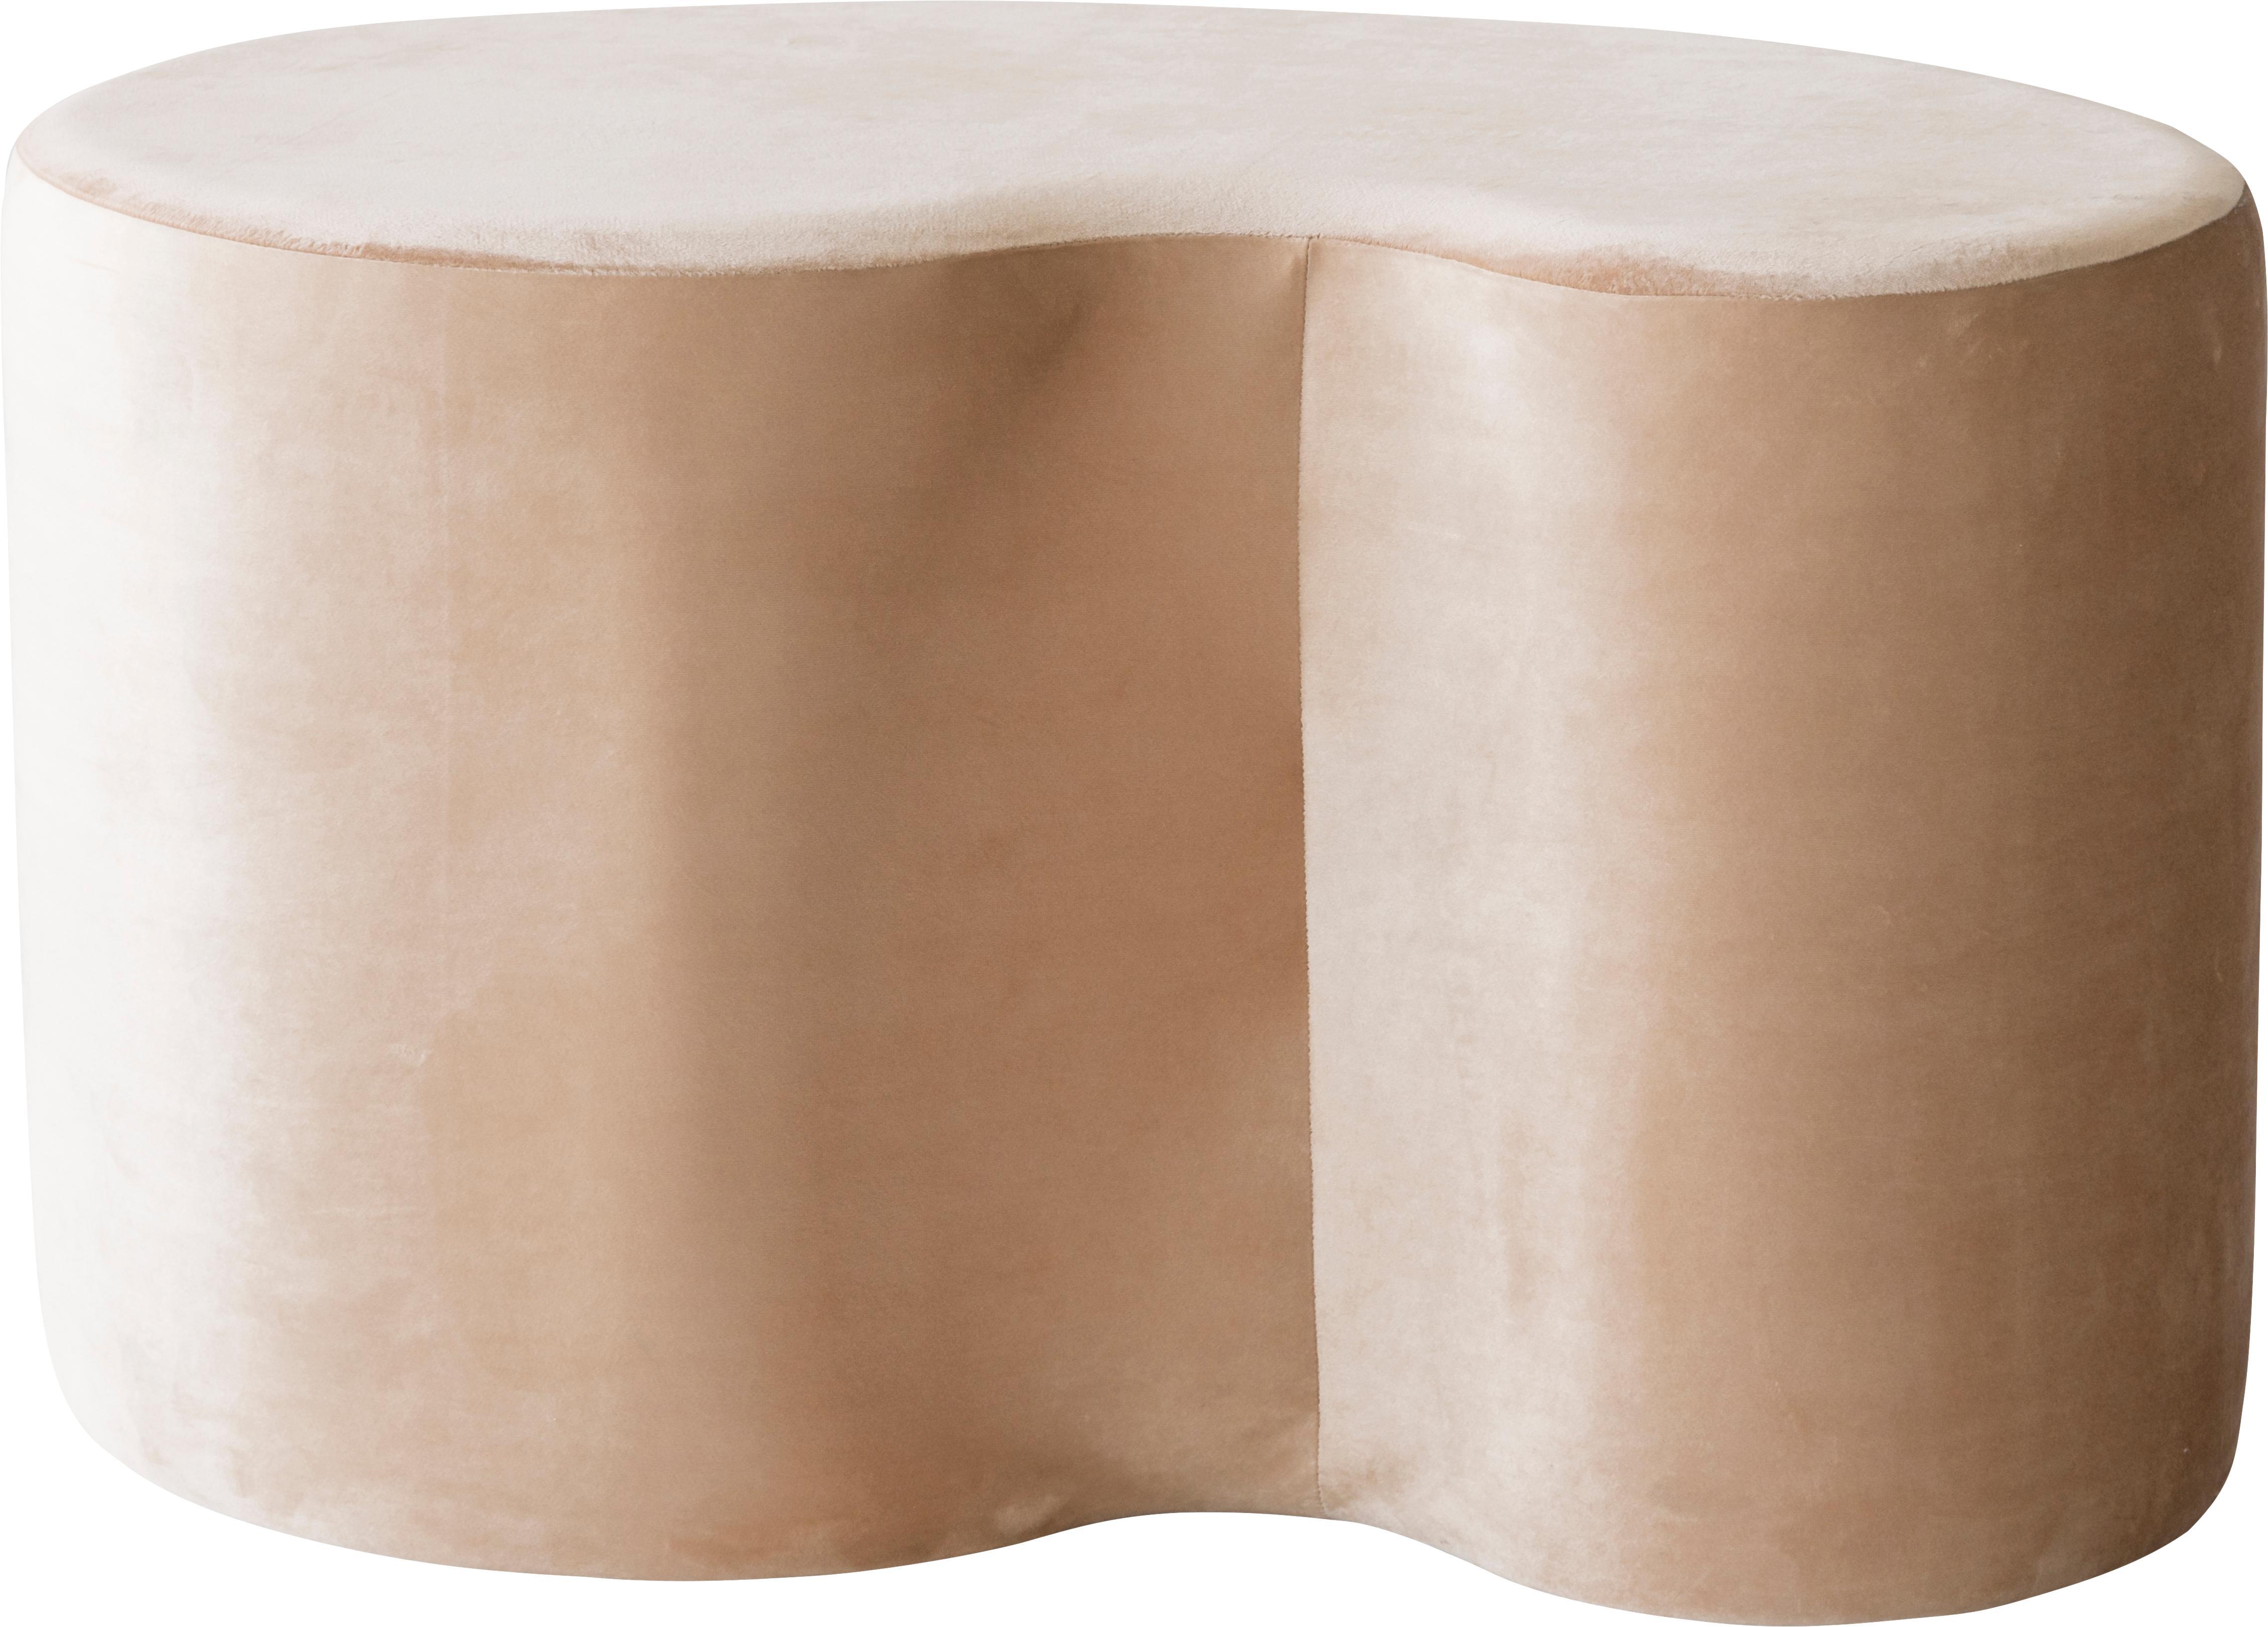 Puf de terciopelo Cloe, Tapizado: terciopelo de poliéster b, Estructura: tablero de fibras de dens, Beige, An 80 x F 50 cm